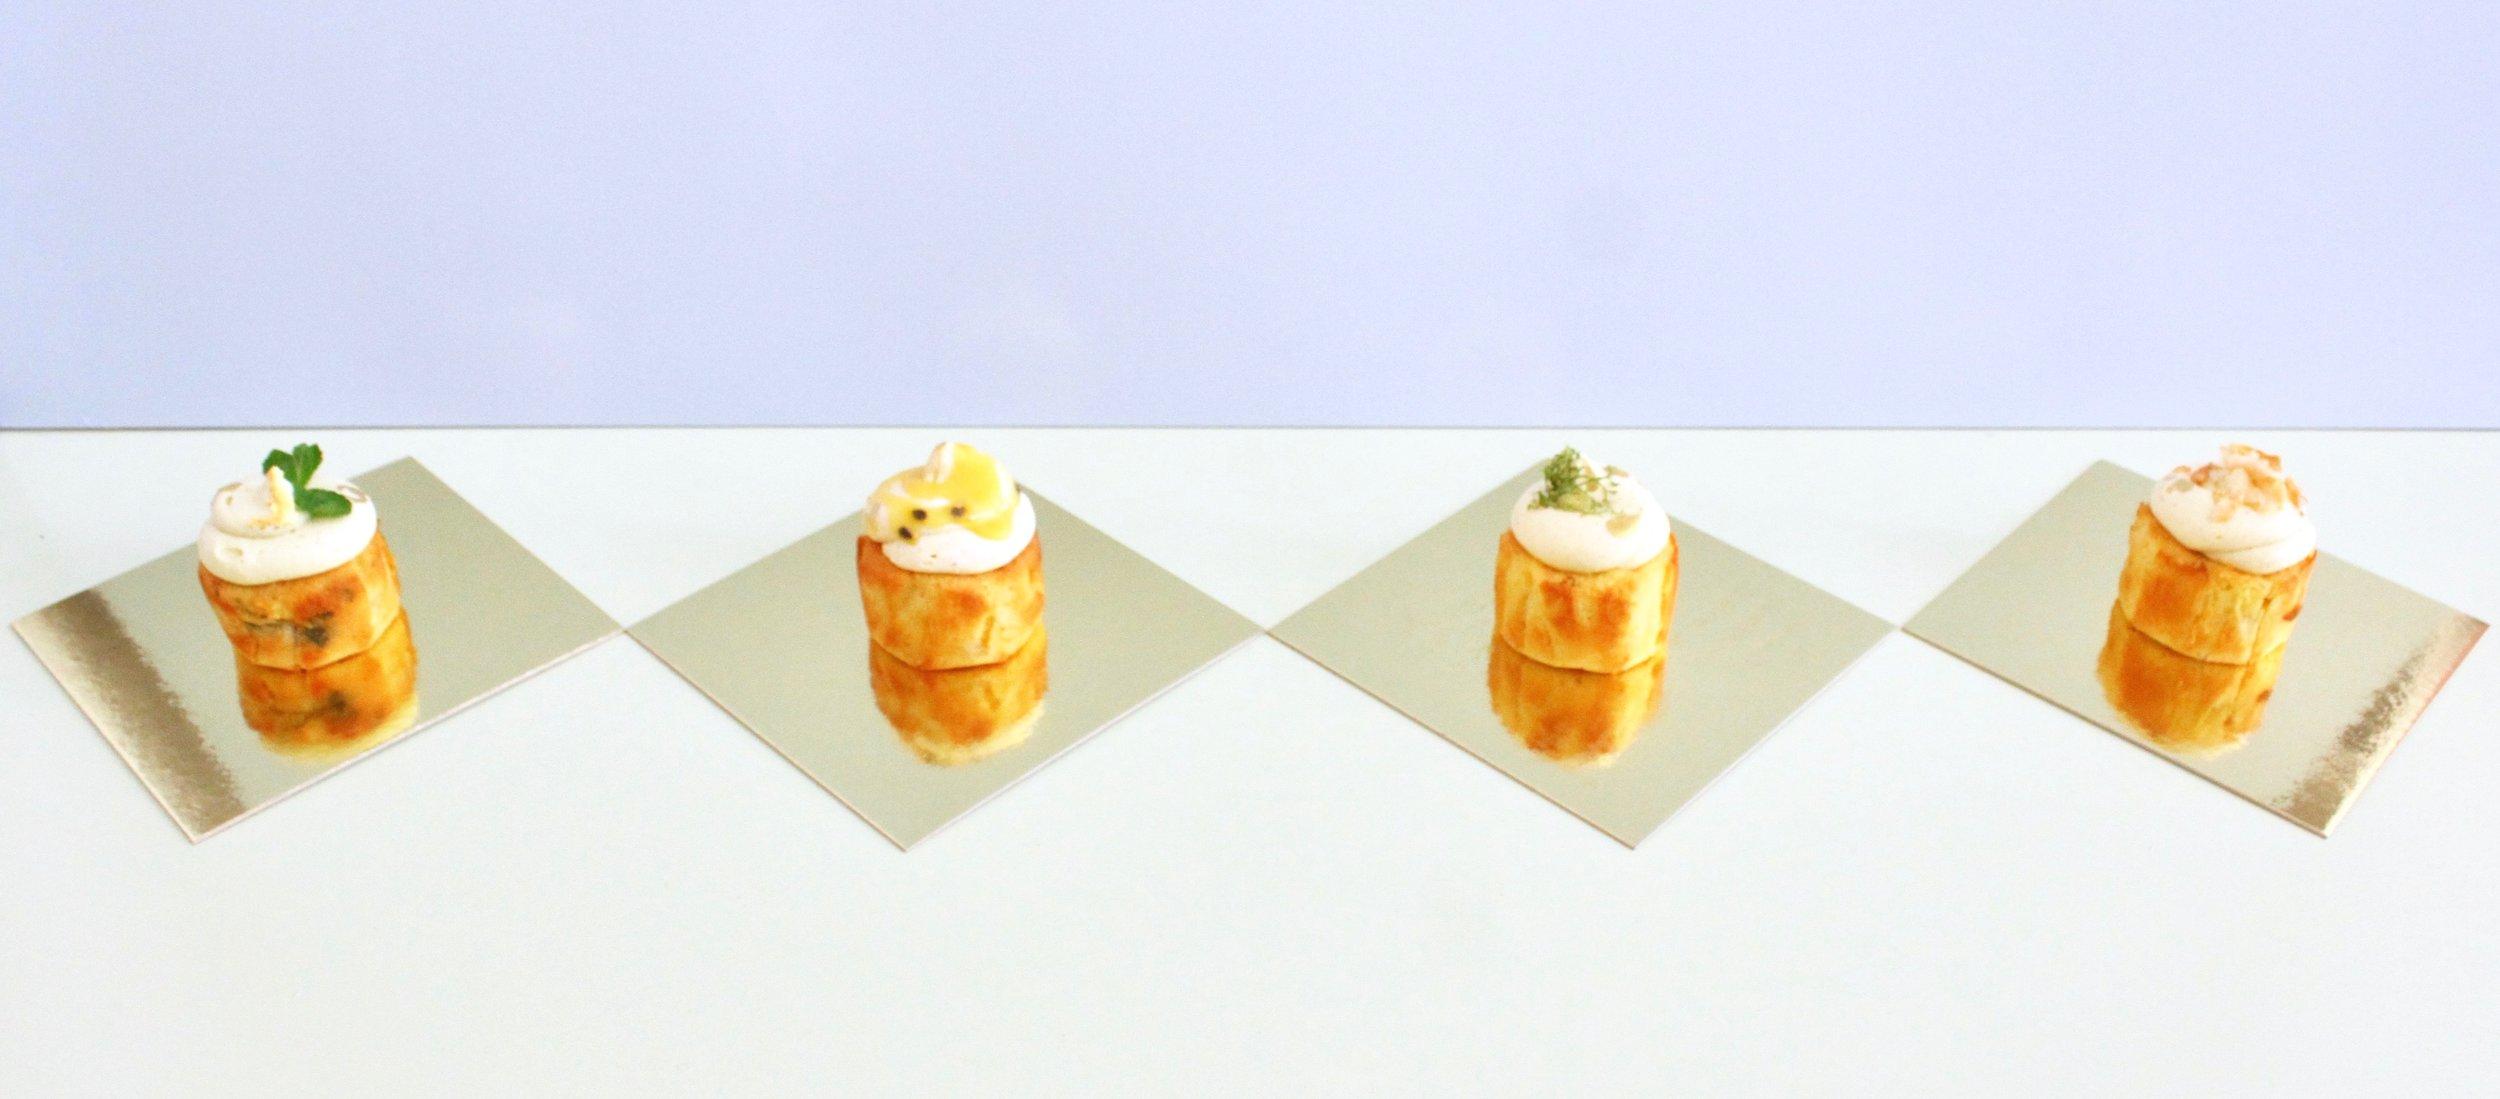 Mango Cakes 4 ways.jpg